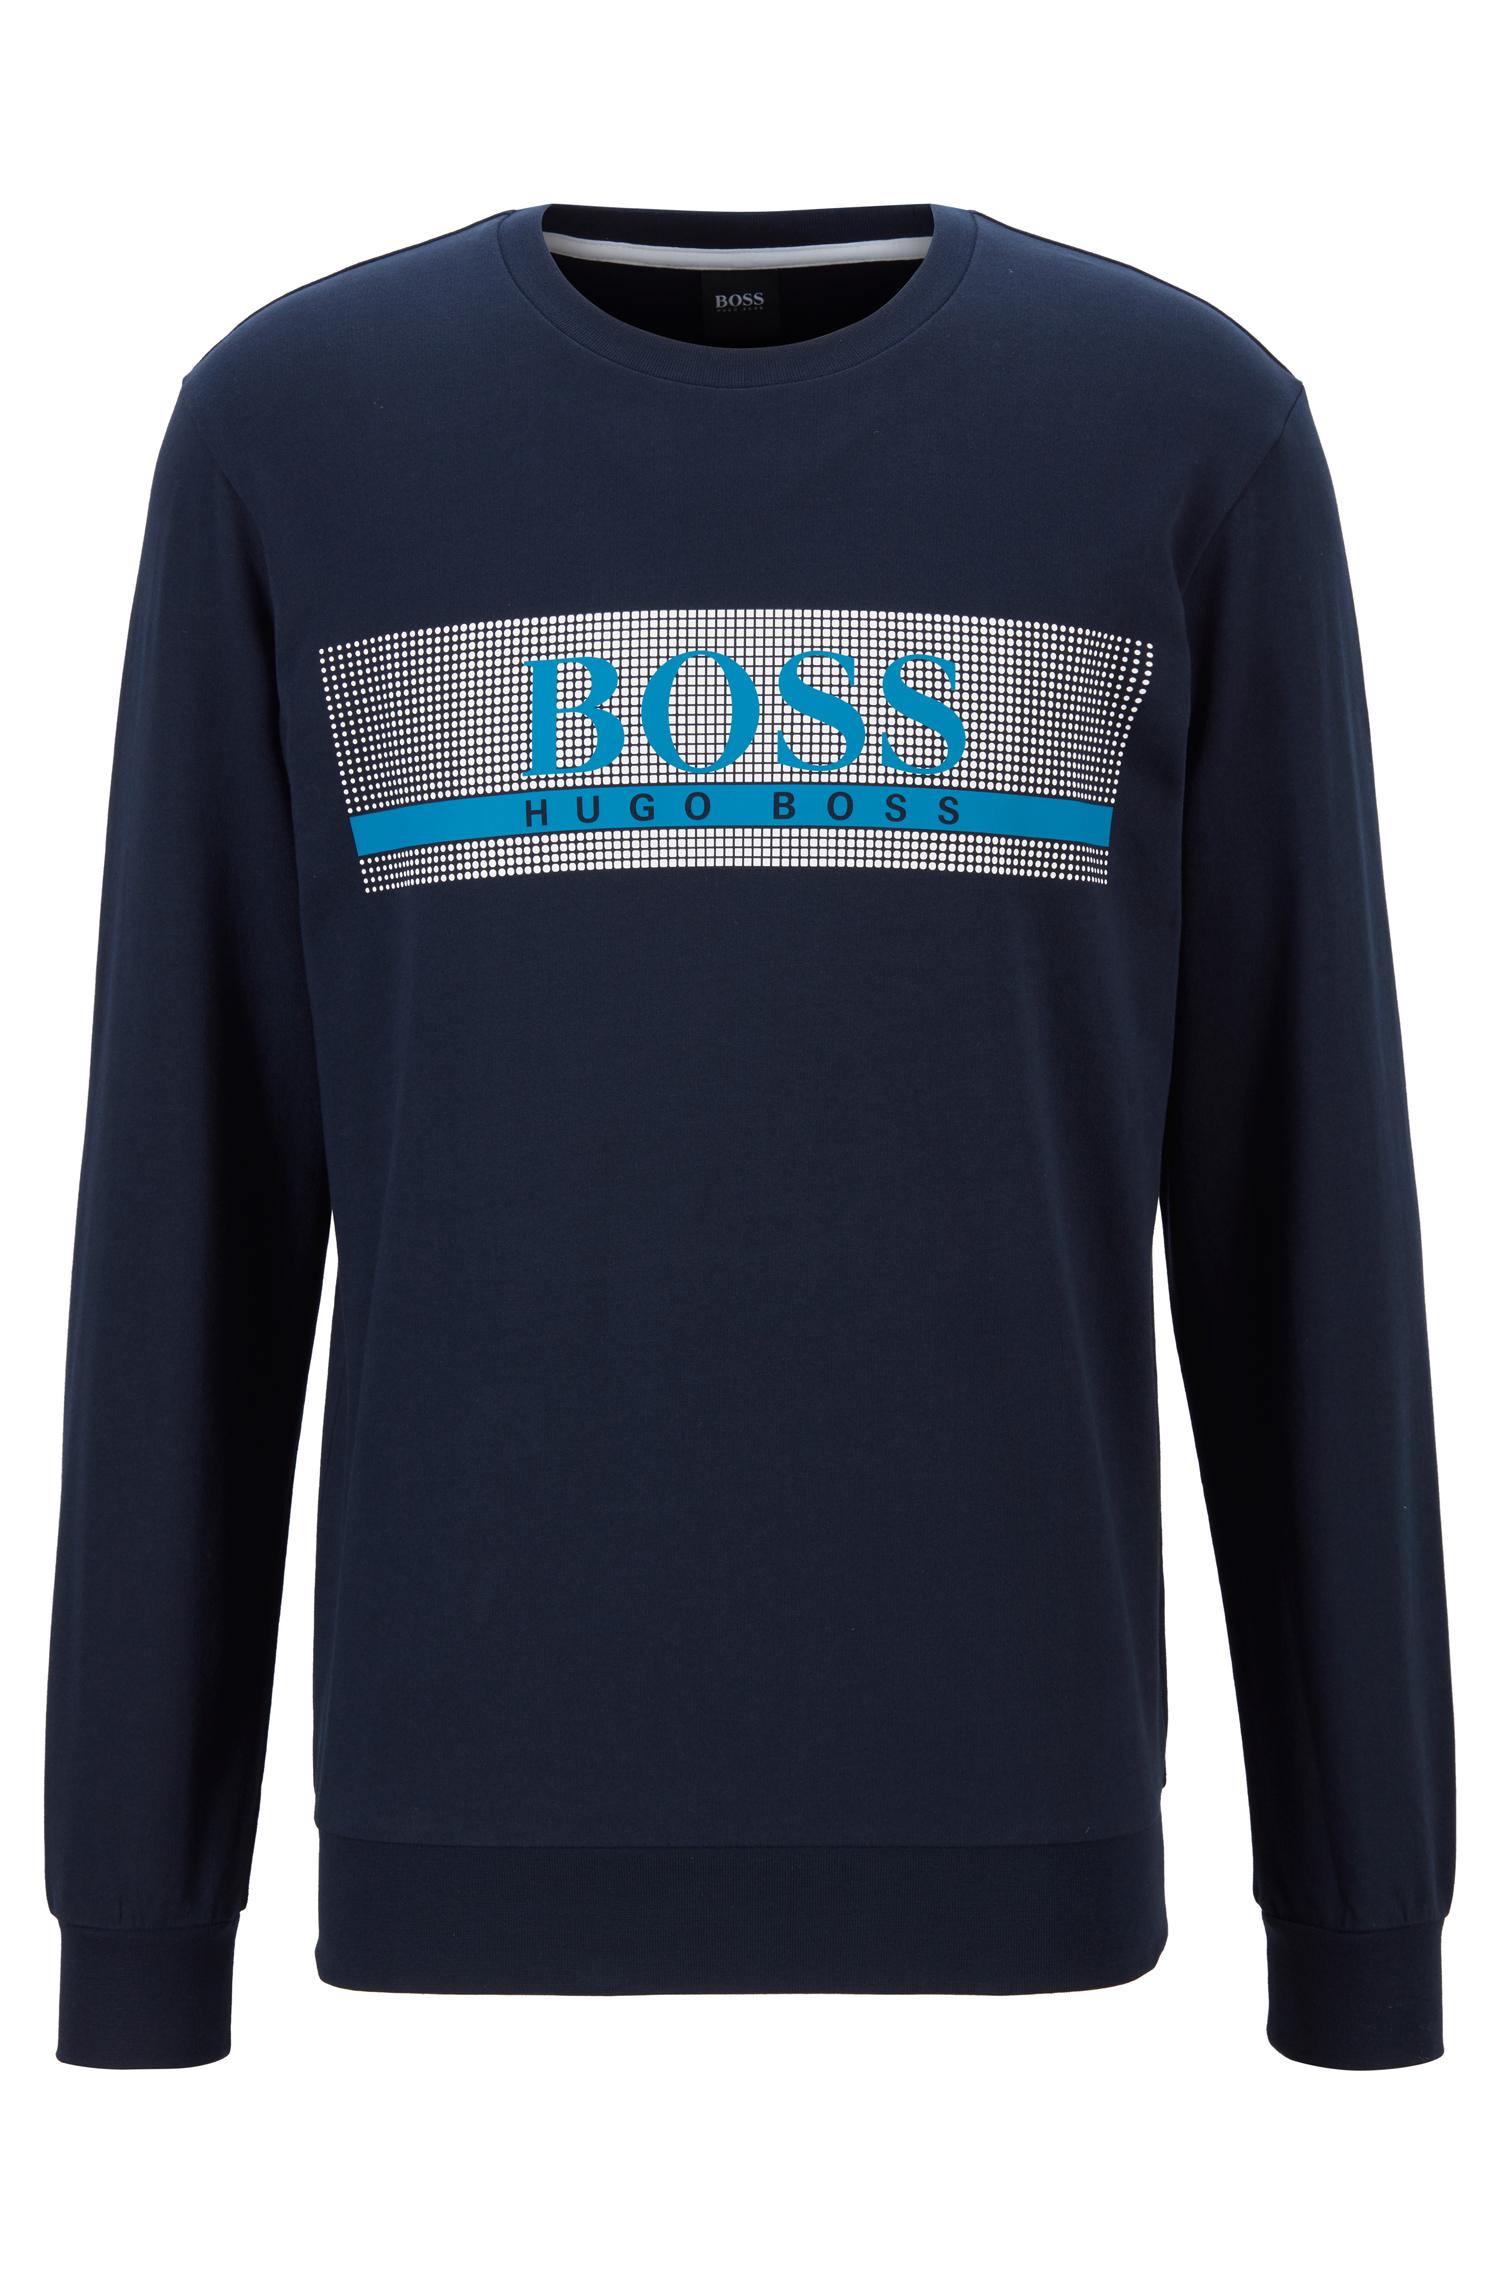 Hugo Boss loungewear sweatshirt